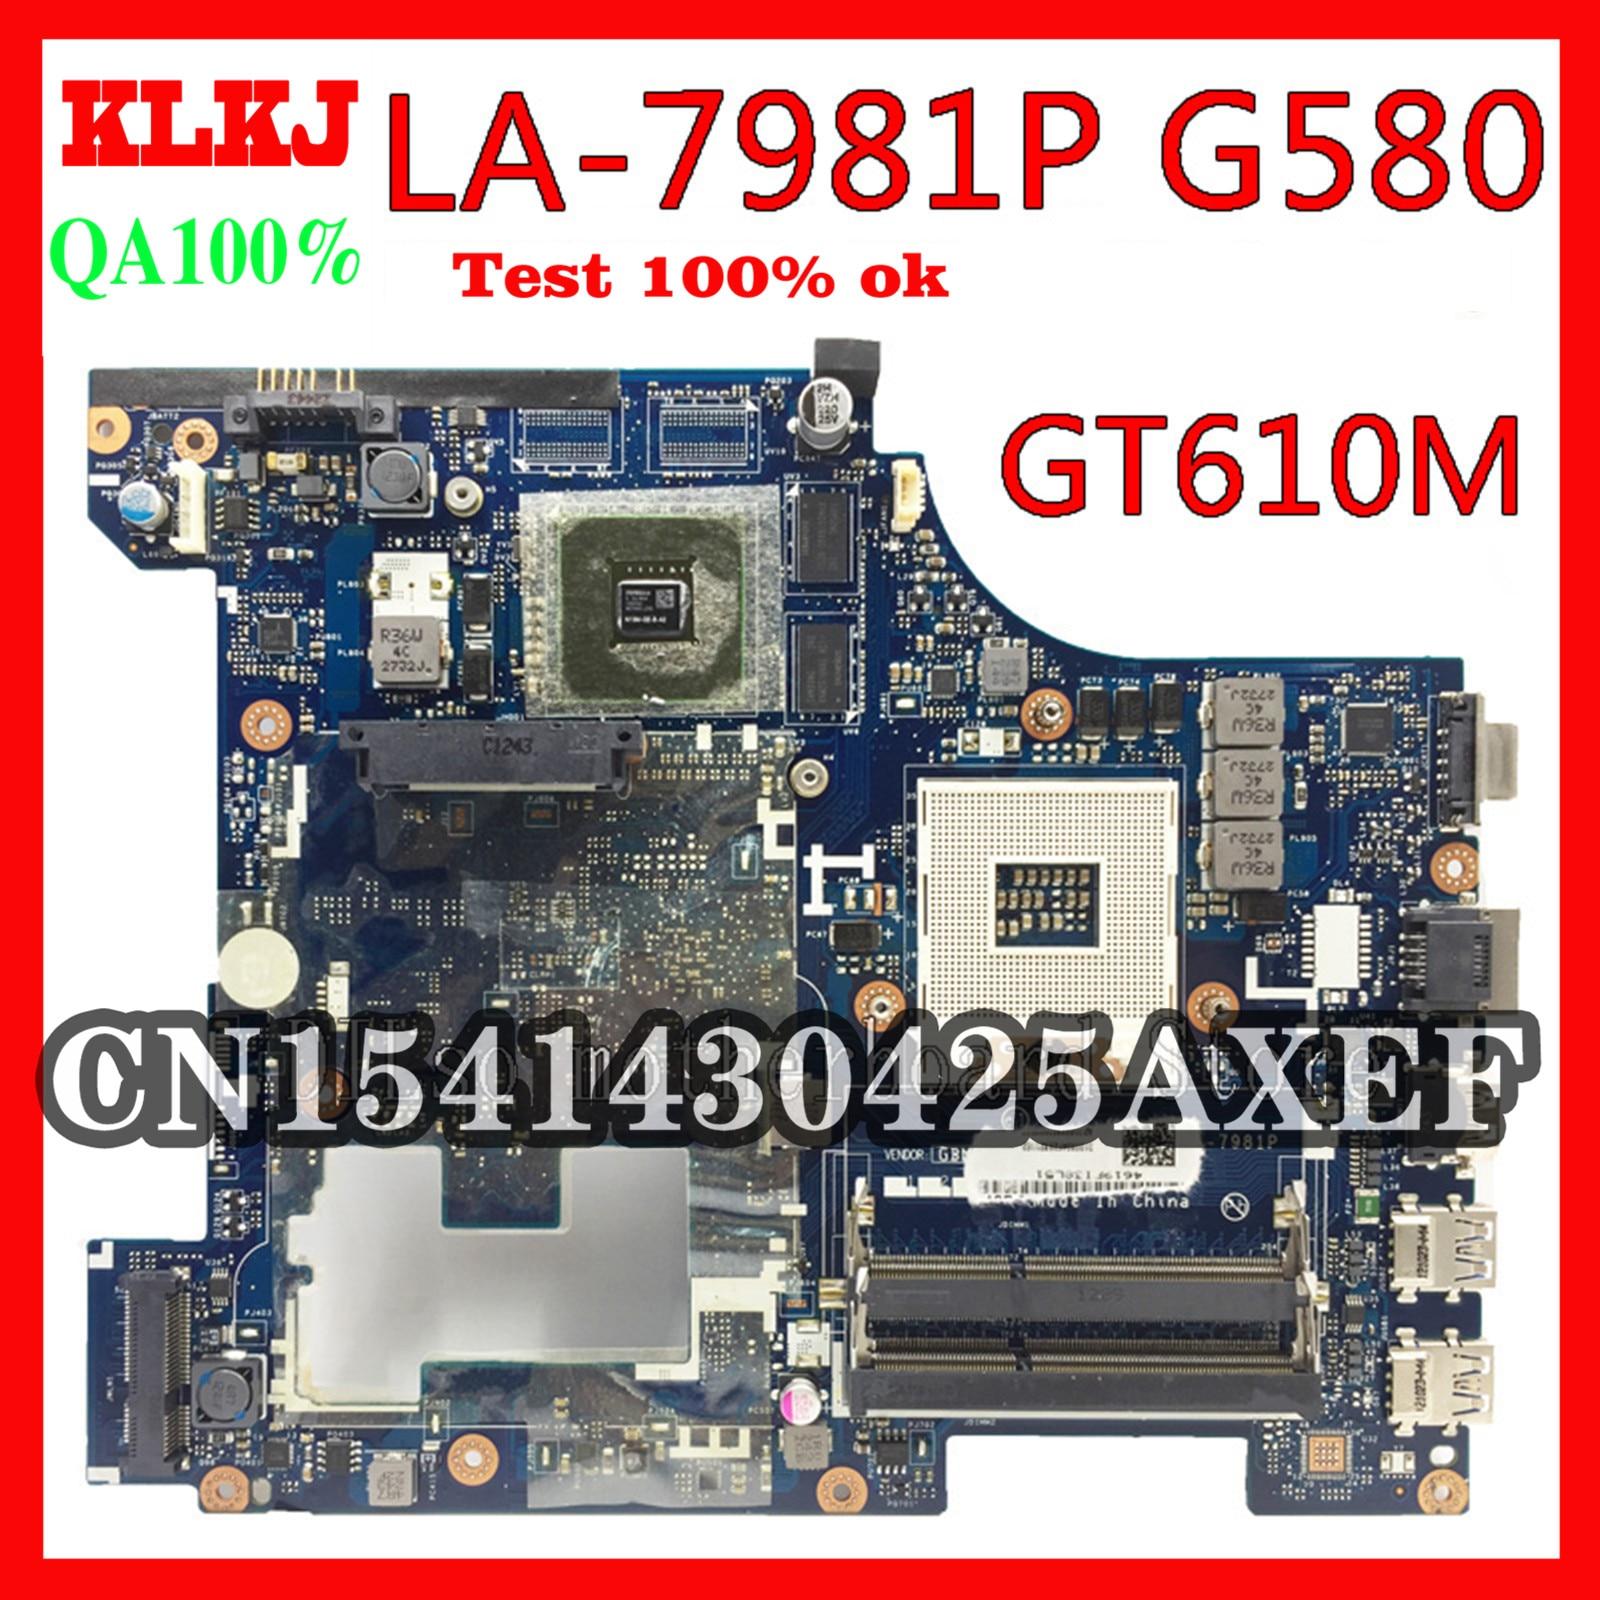 KLKJ LA-7981P G580 اللوحة لينوفو G580 QIWG5_G6_G9 LA-7981P REV:1.0 GT610M اللوحة الأم اختبار اللوحة الأم